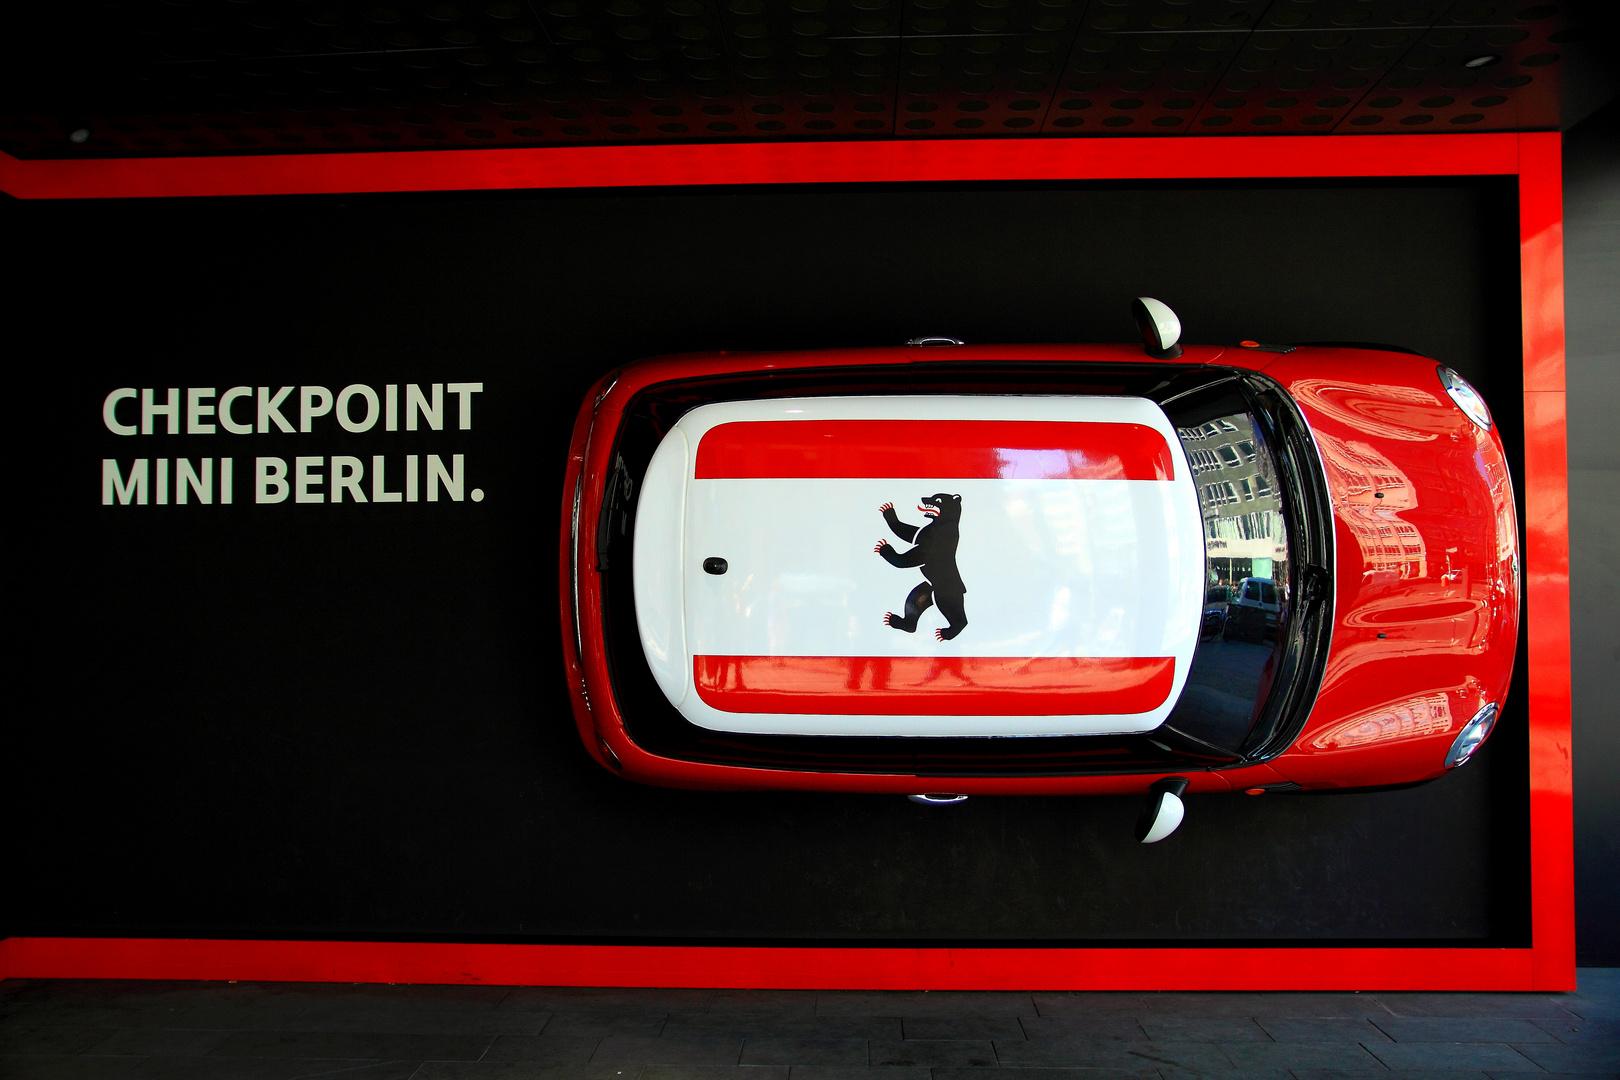 Checkpoint Mini Berlin